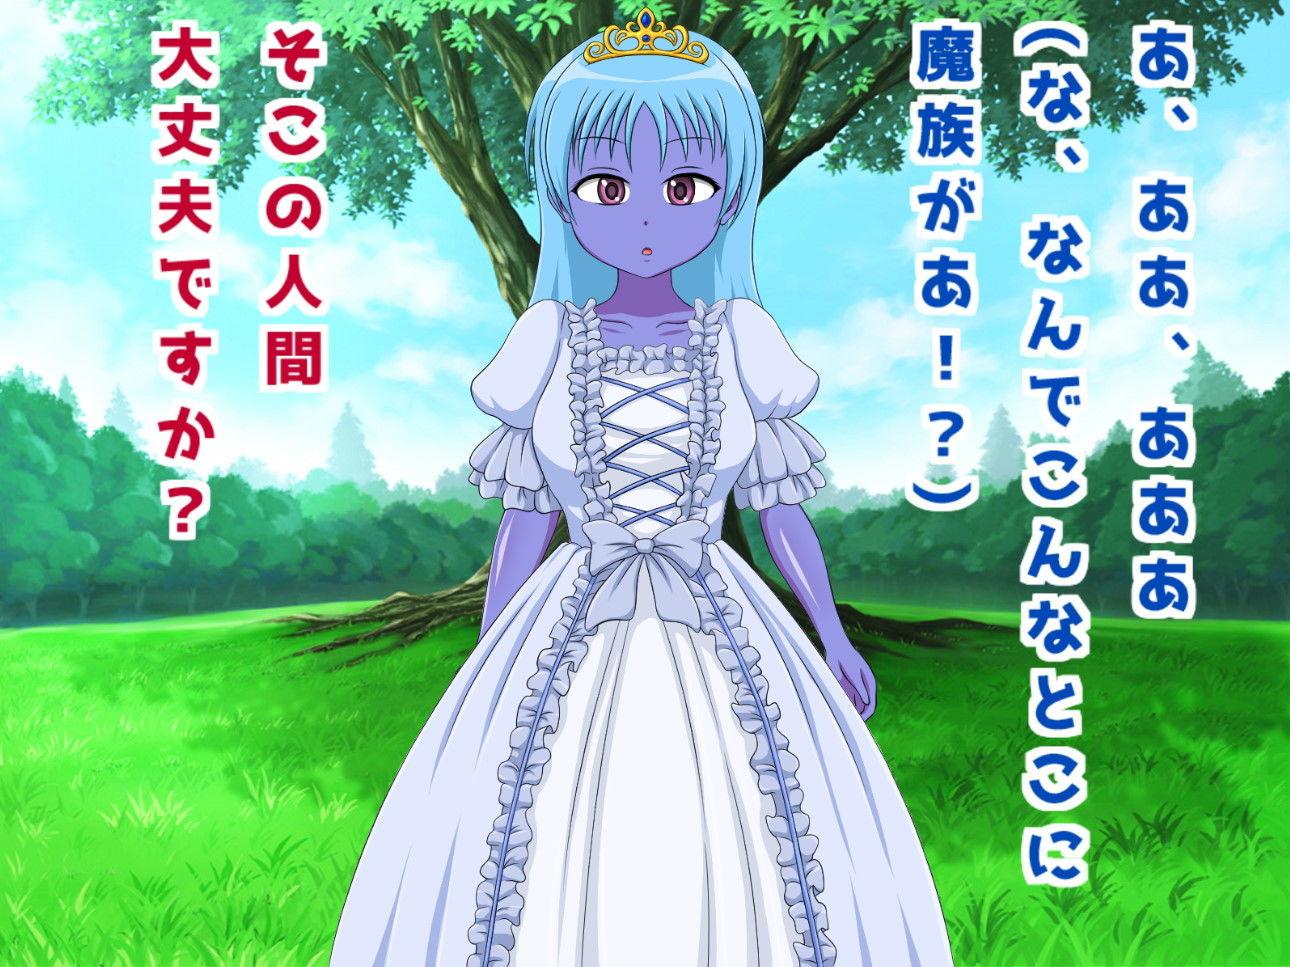 【n 同人】魔族の姫とイチャラブセックス